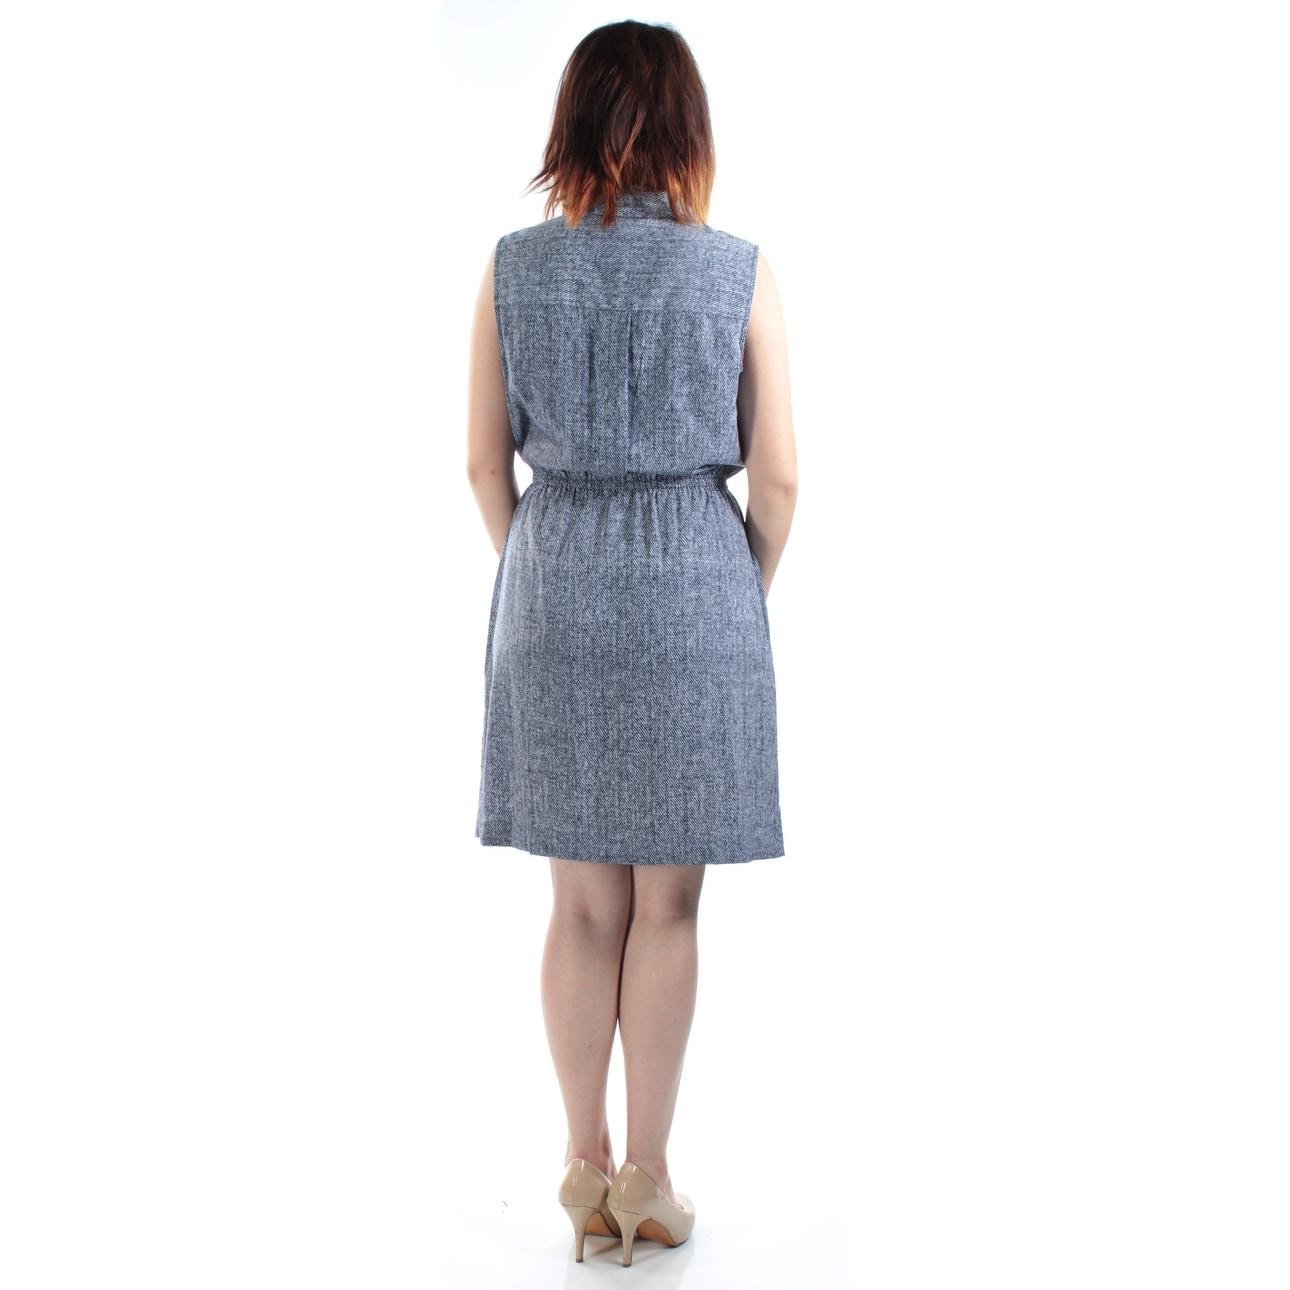 Shop Alfani Womens Navy Printed Sleeveless Collared Above The Knee